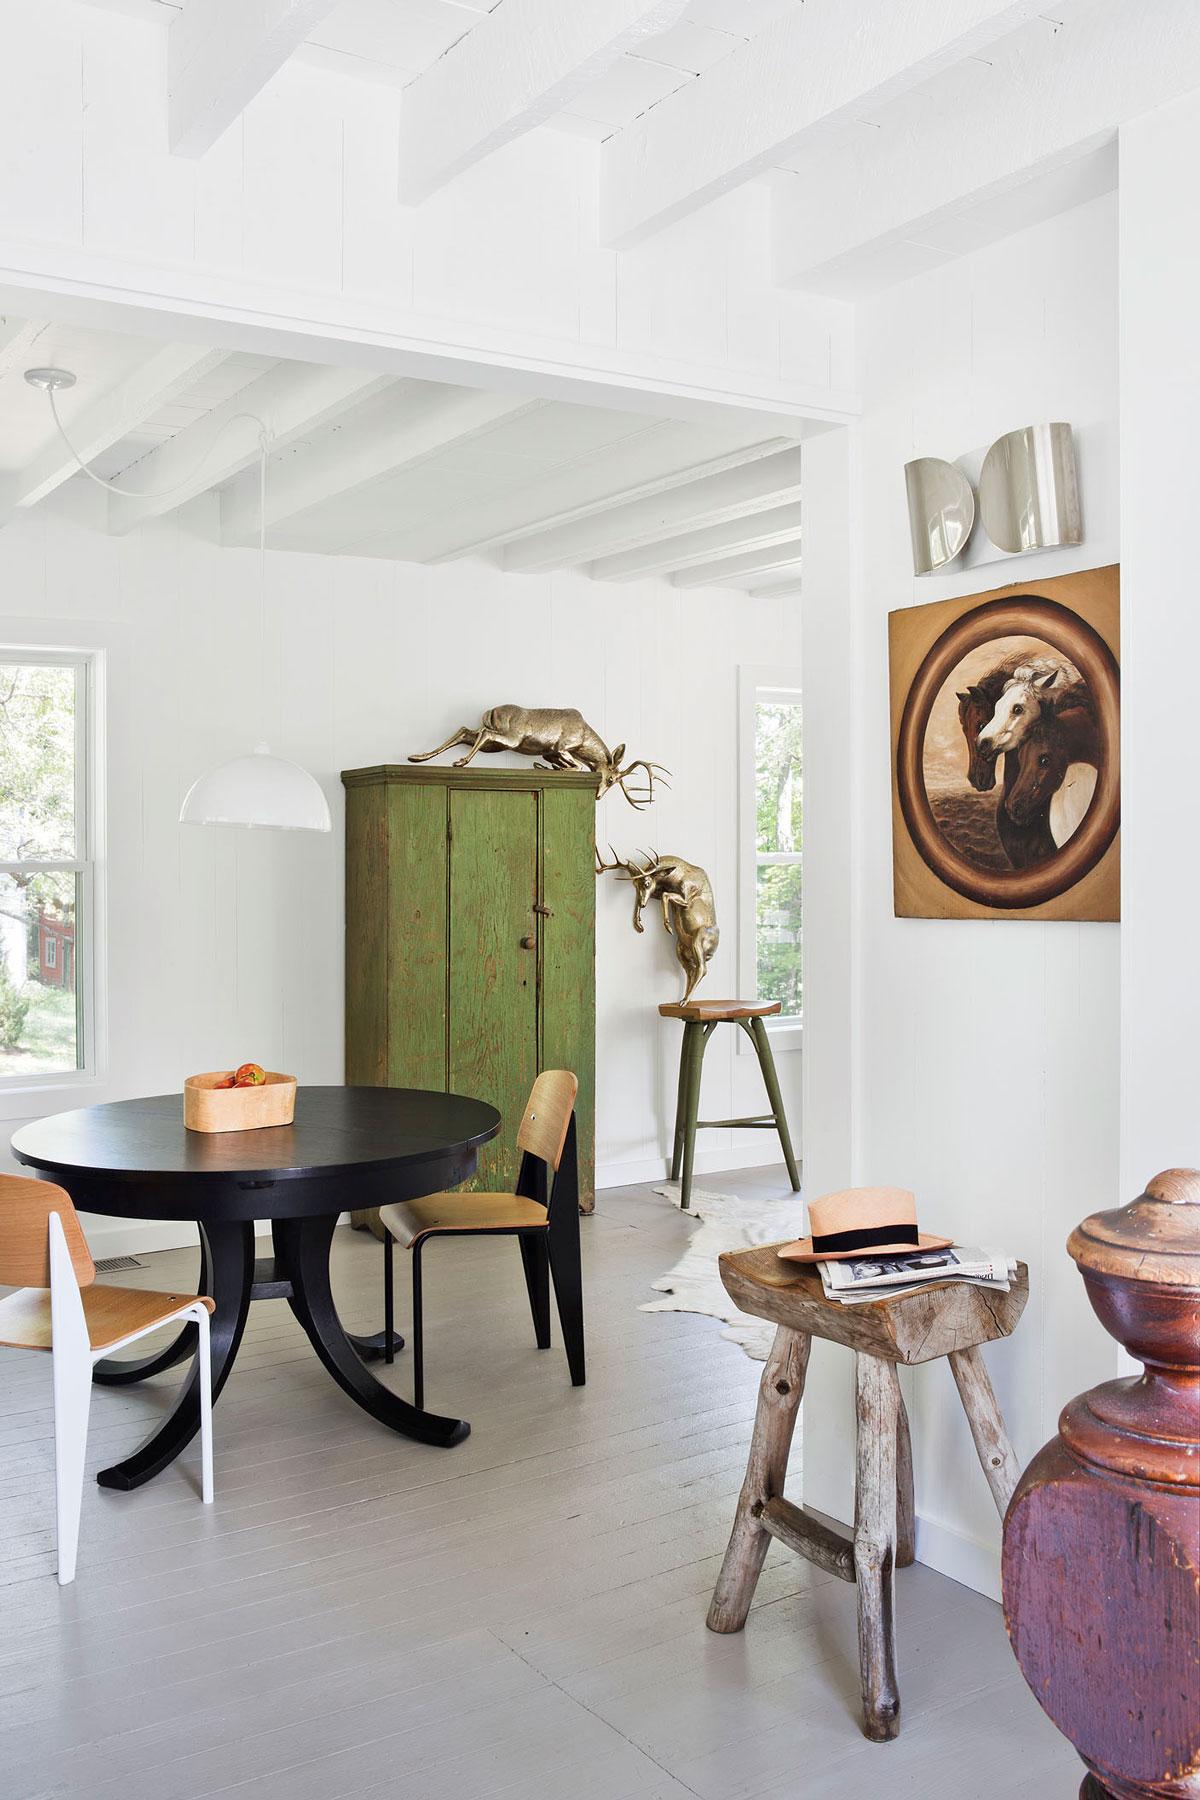 serge-castella-interiors-cottage-adirondaks-02